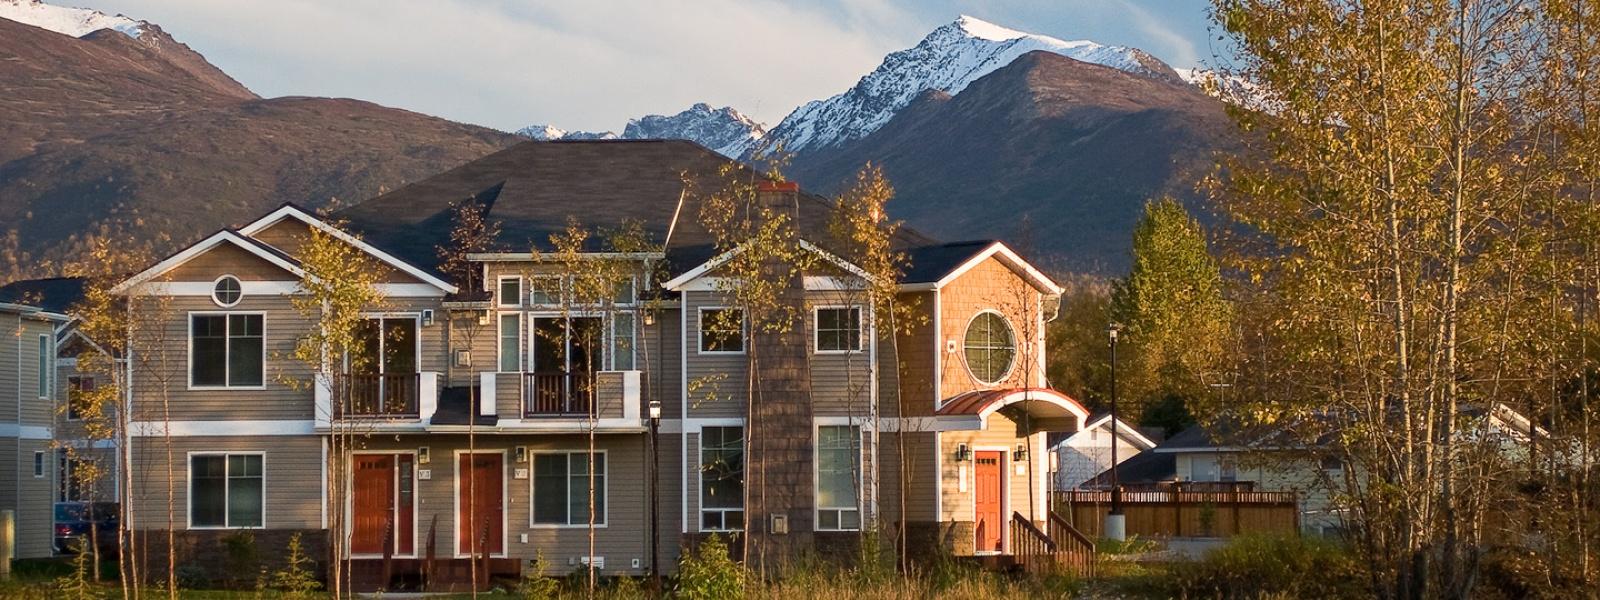 7700 Creekside Center Drive, Anchorage, Alaska, 99504, 1 Bedroom Bedrooms, ,1 BathroomBathrooms,Townhome,For Rent,Creekside Center Drive,1035